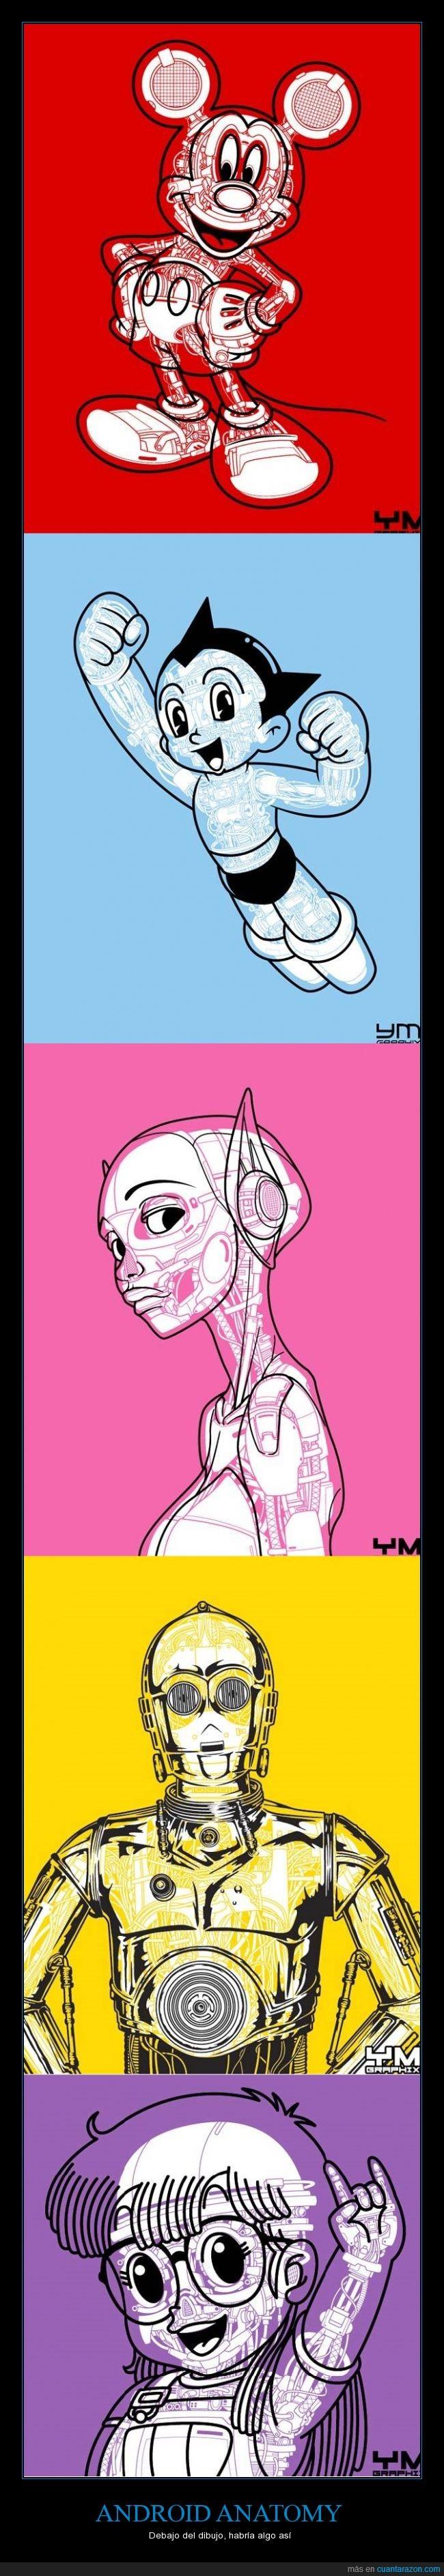 androide,arale,astroboy,c3po,debajo,mickey mouse,robot